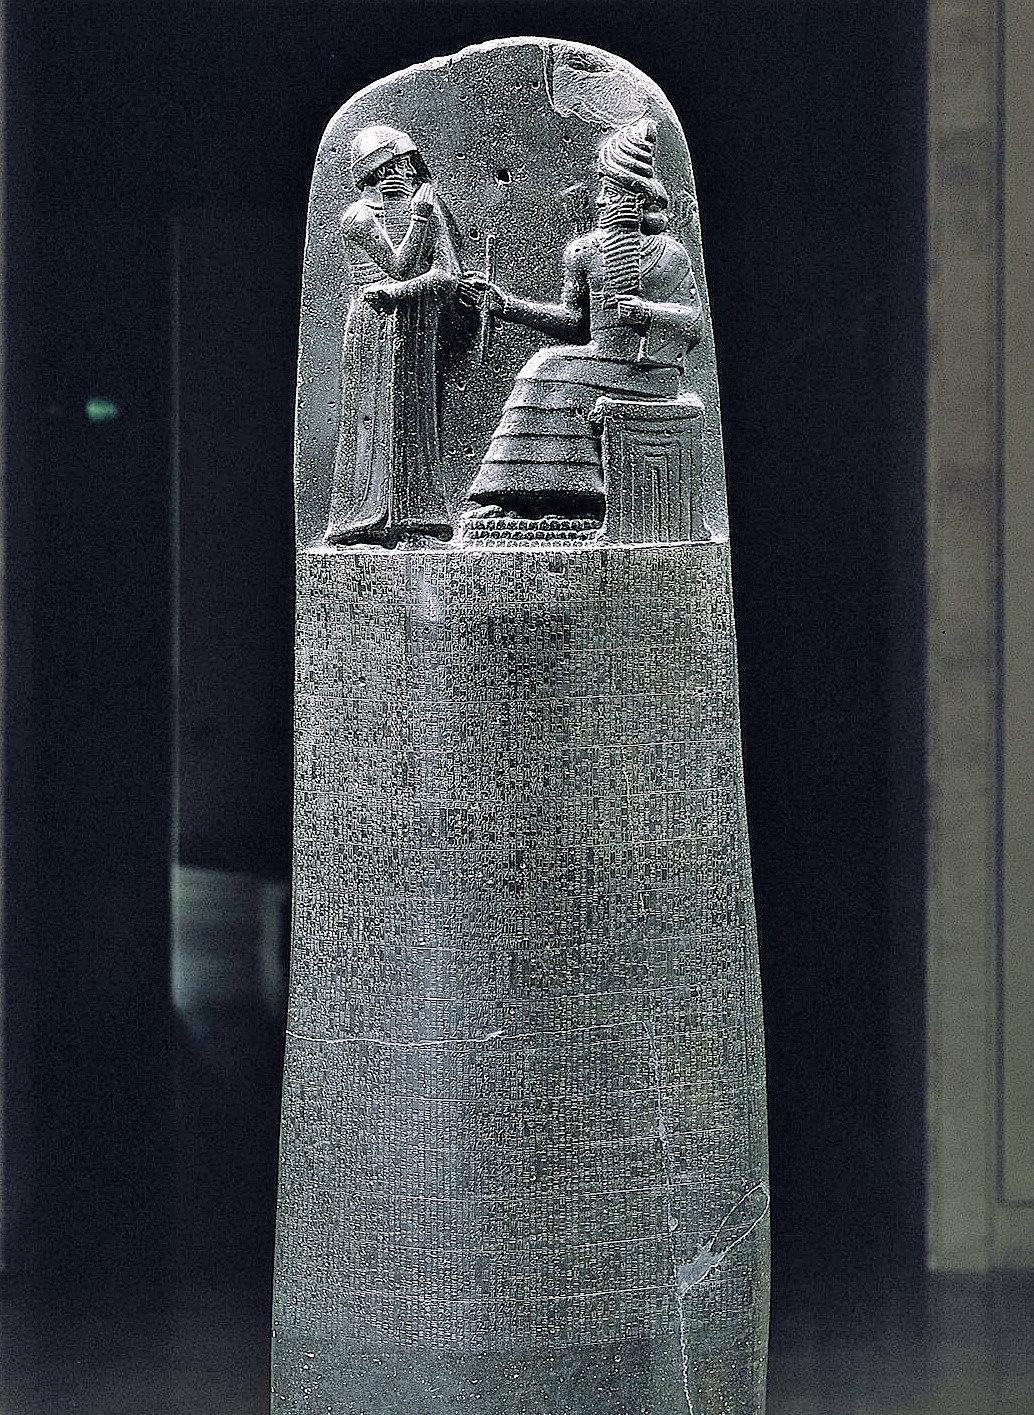 Hammurabi-Kanunlar%C4%B1-Louvre-M%C3%BCz